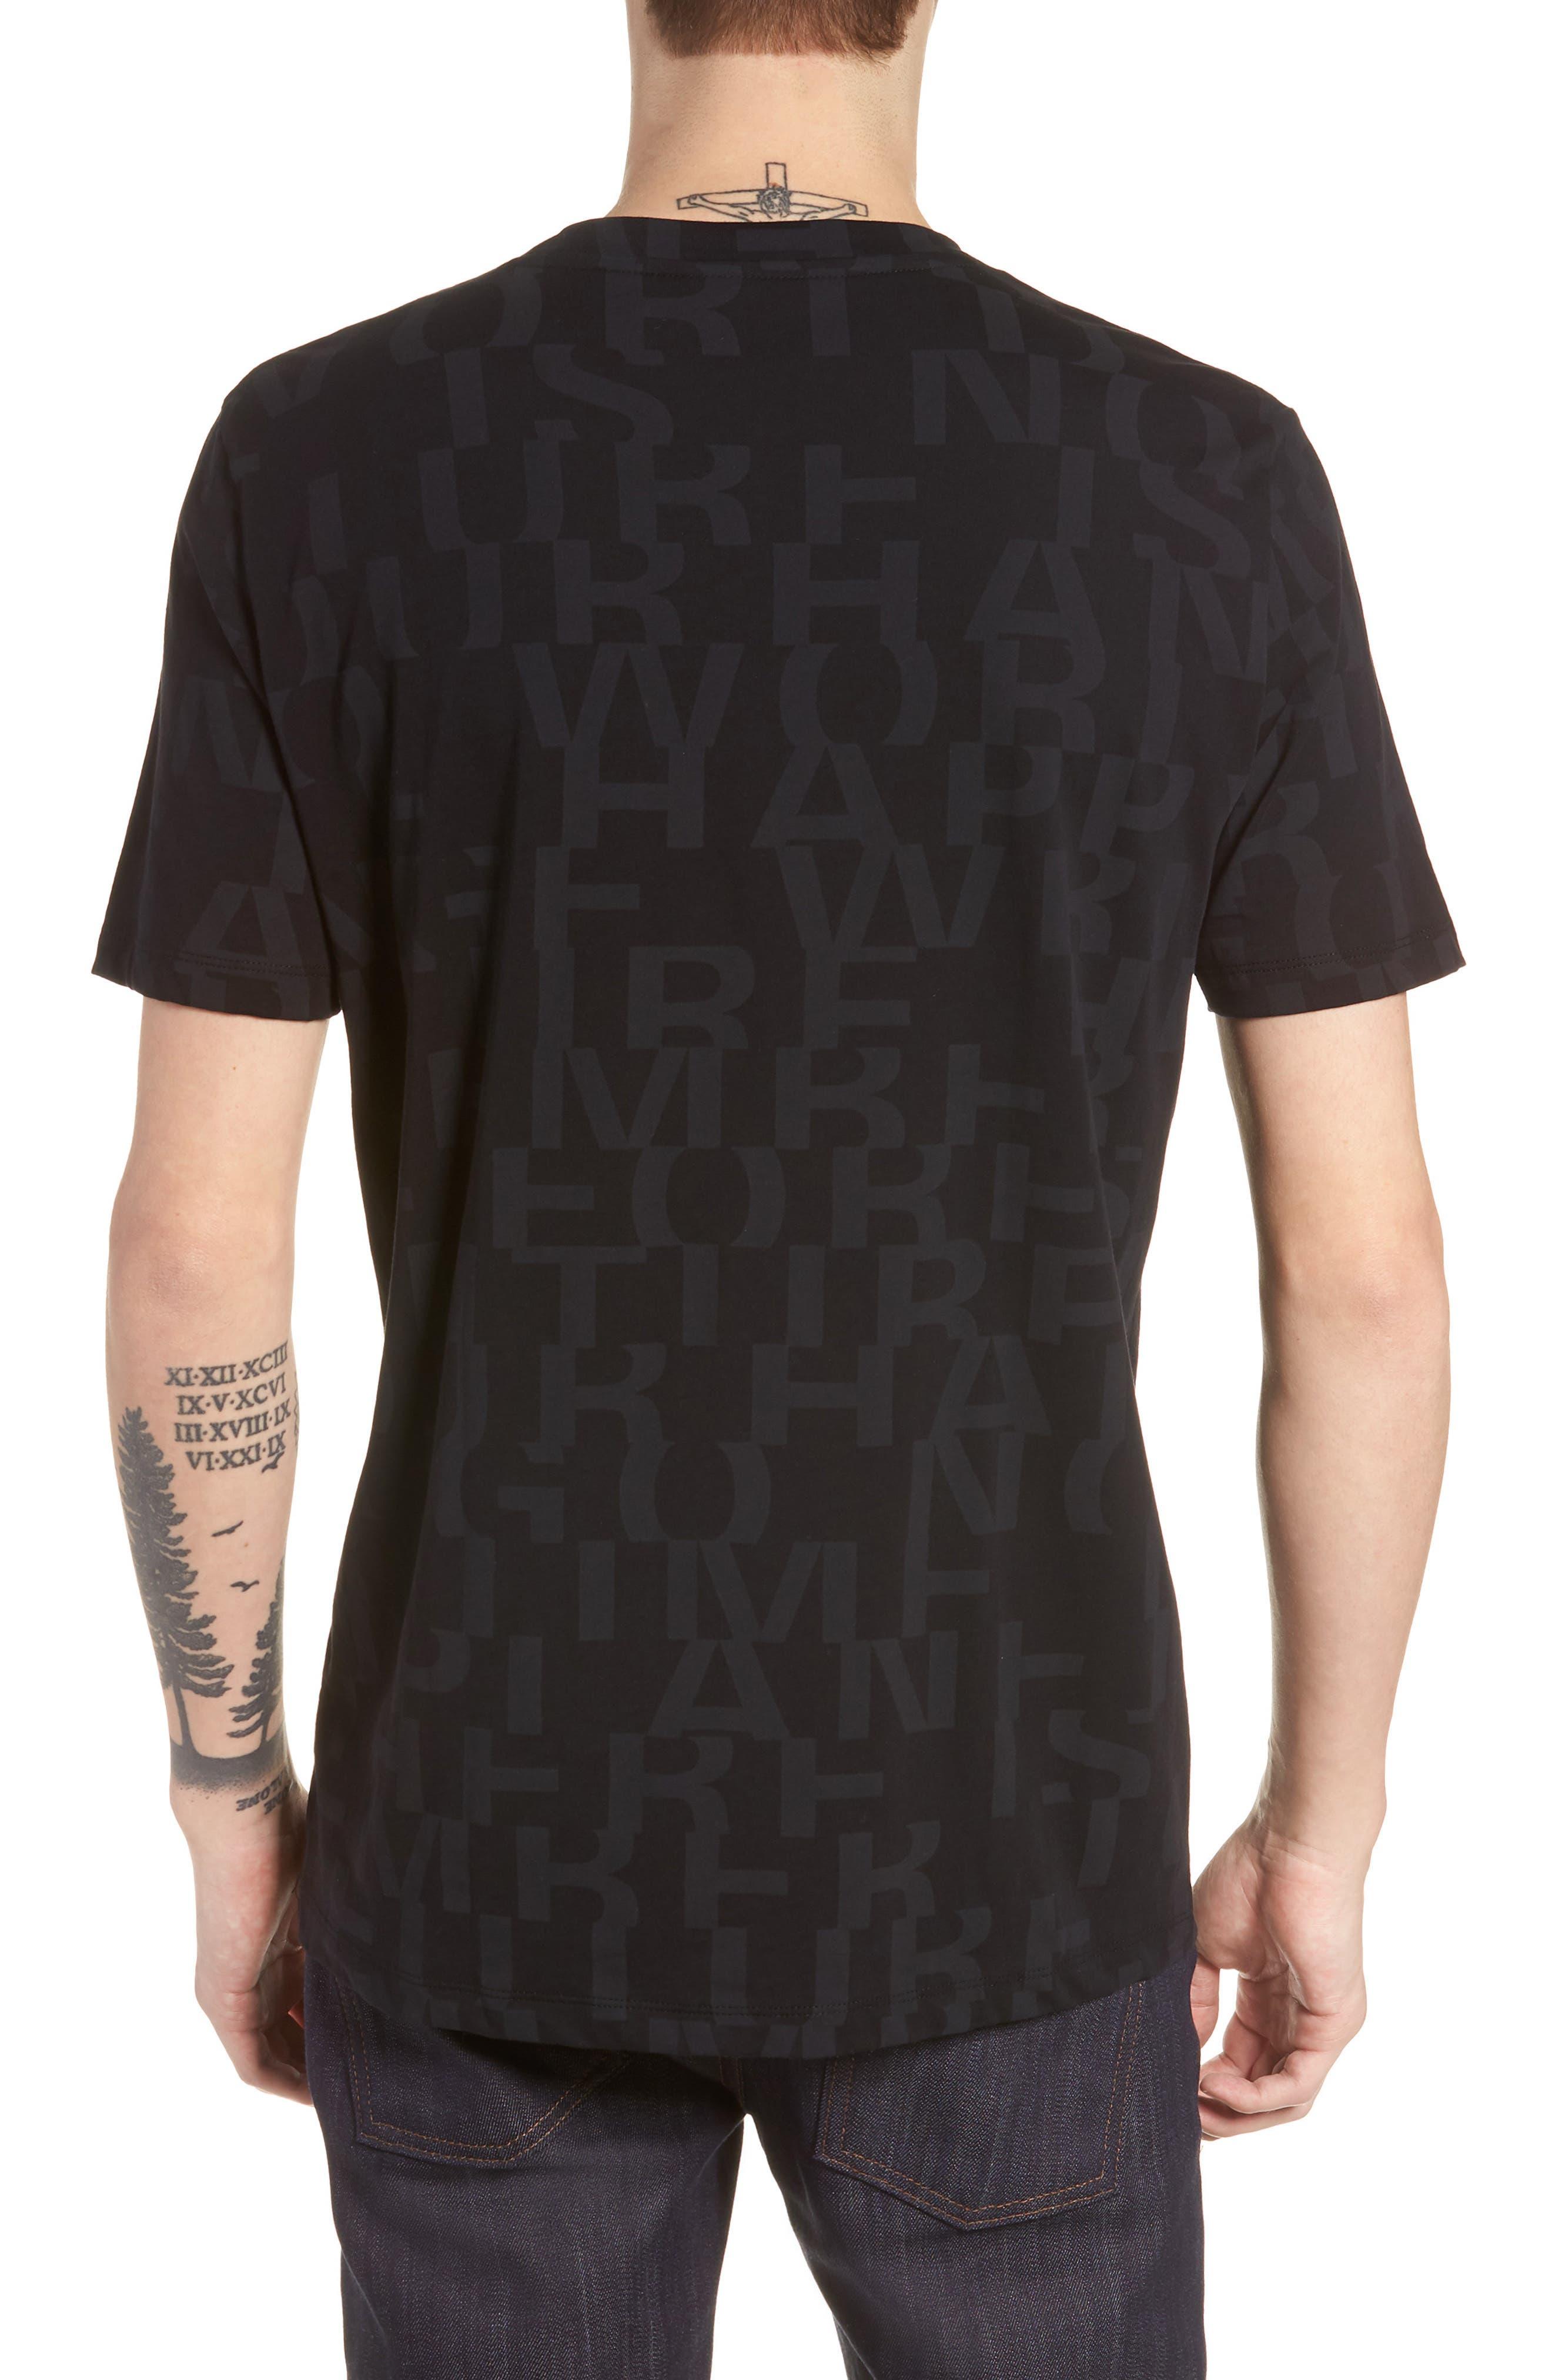 Dyrics Letter Graphic T-Shirt,                             Alternate thumbnail 2, color,                             BLACK